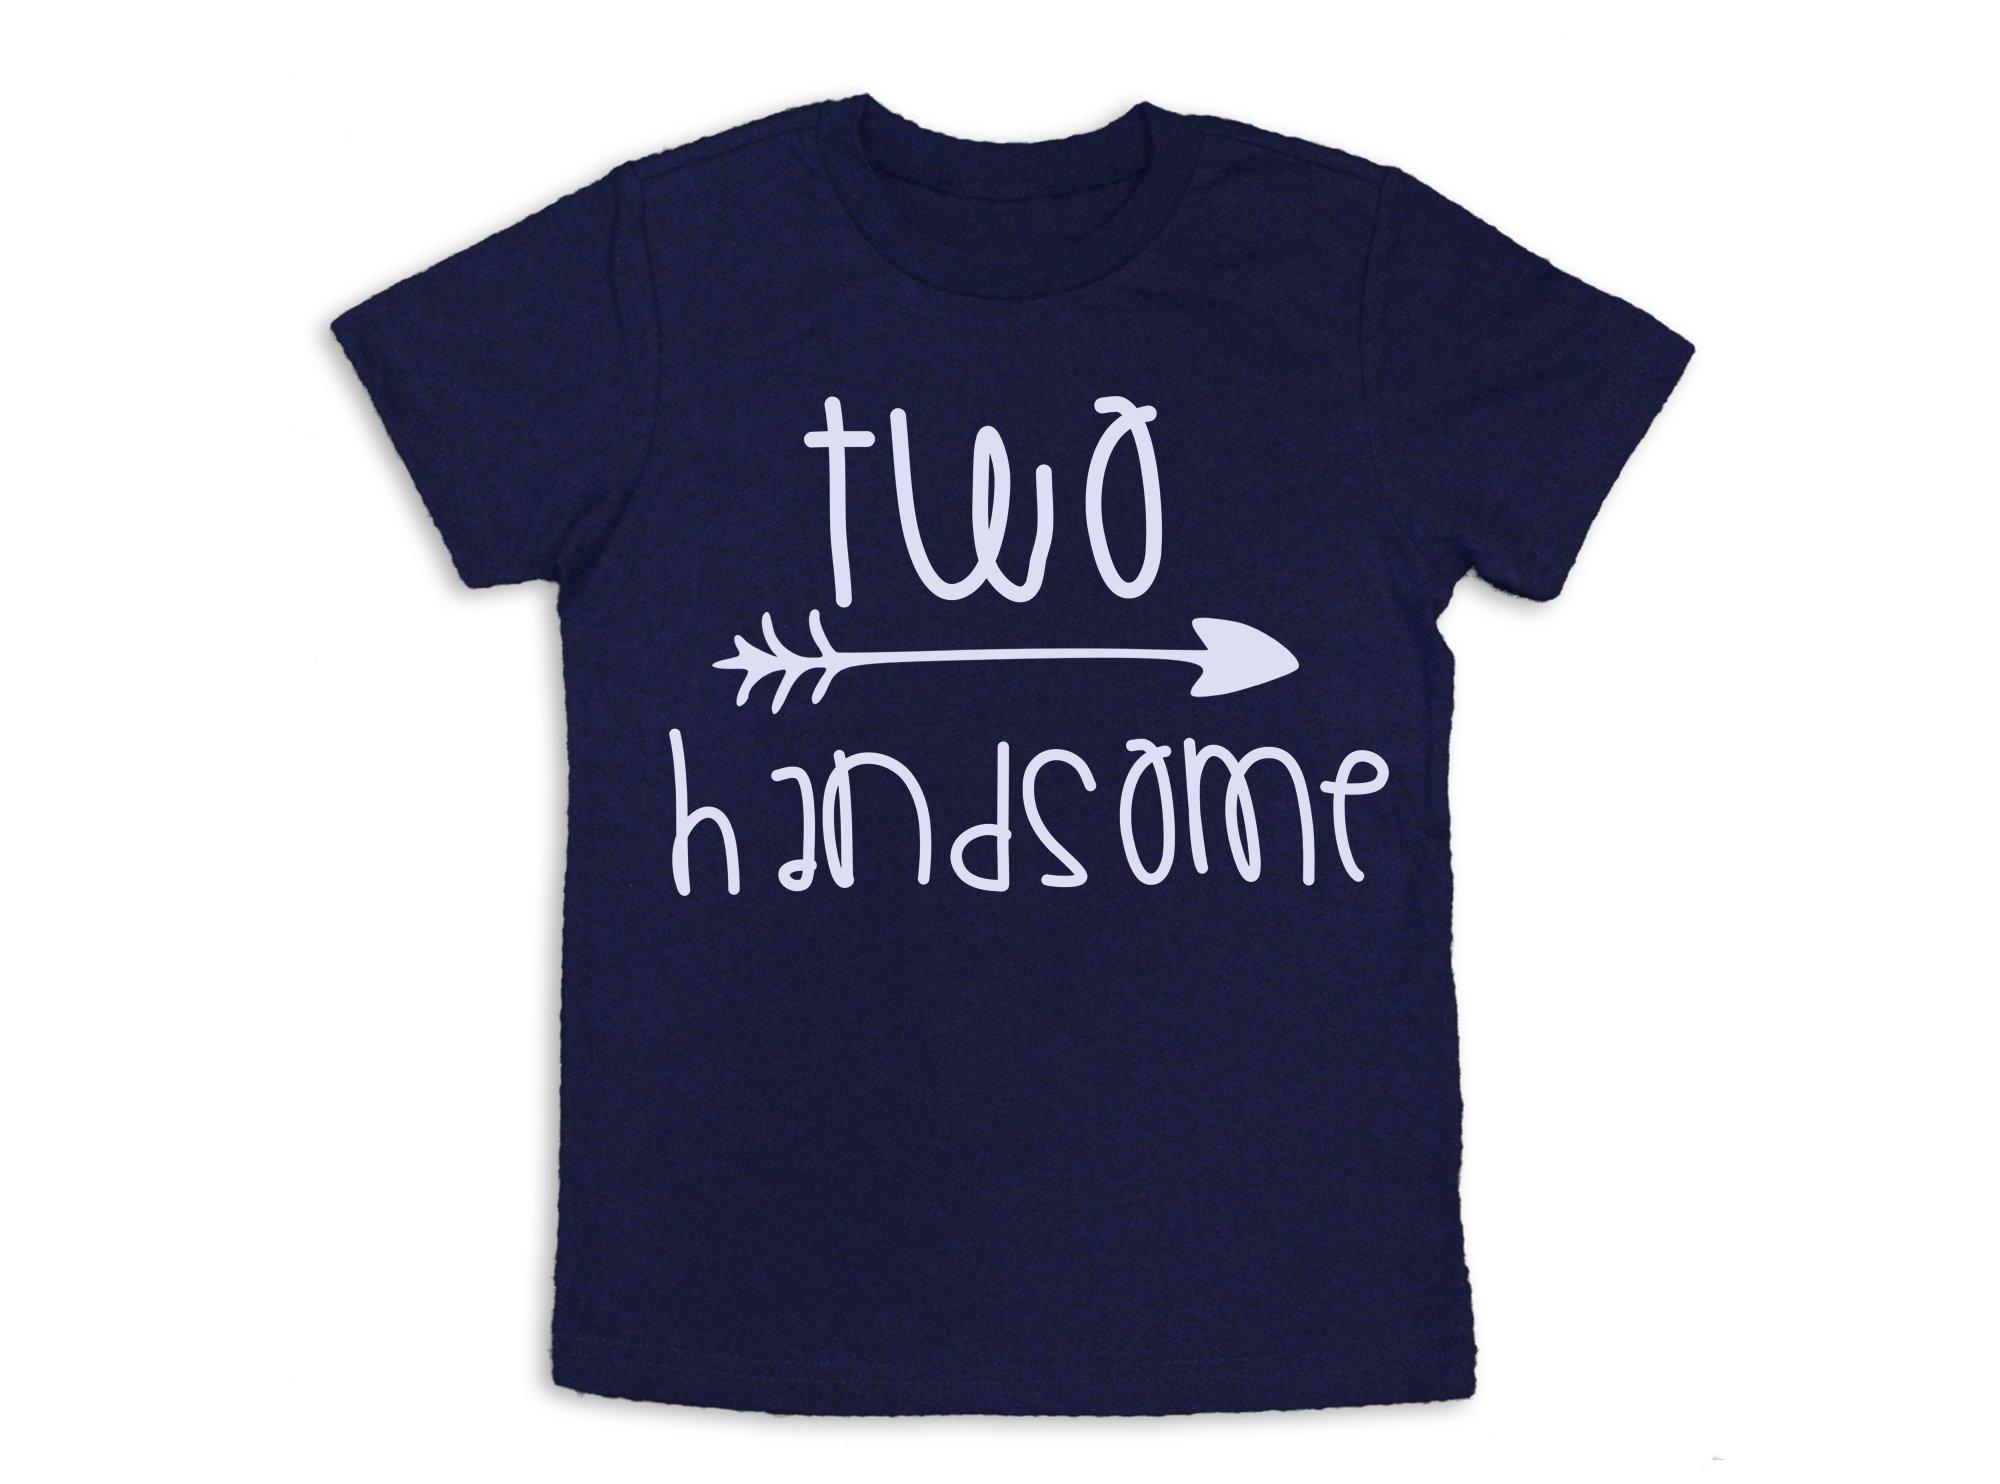 Second Birthday Shirt Two Handsome Shirt 2nd Birthday Tee (Navy Blue, 3T)